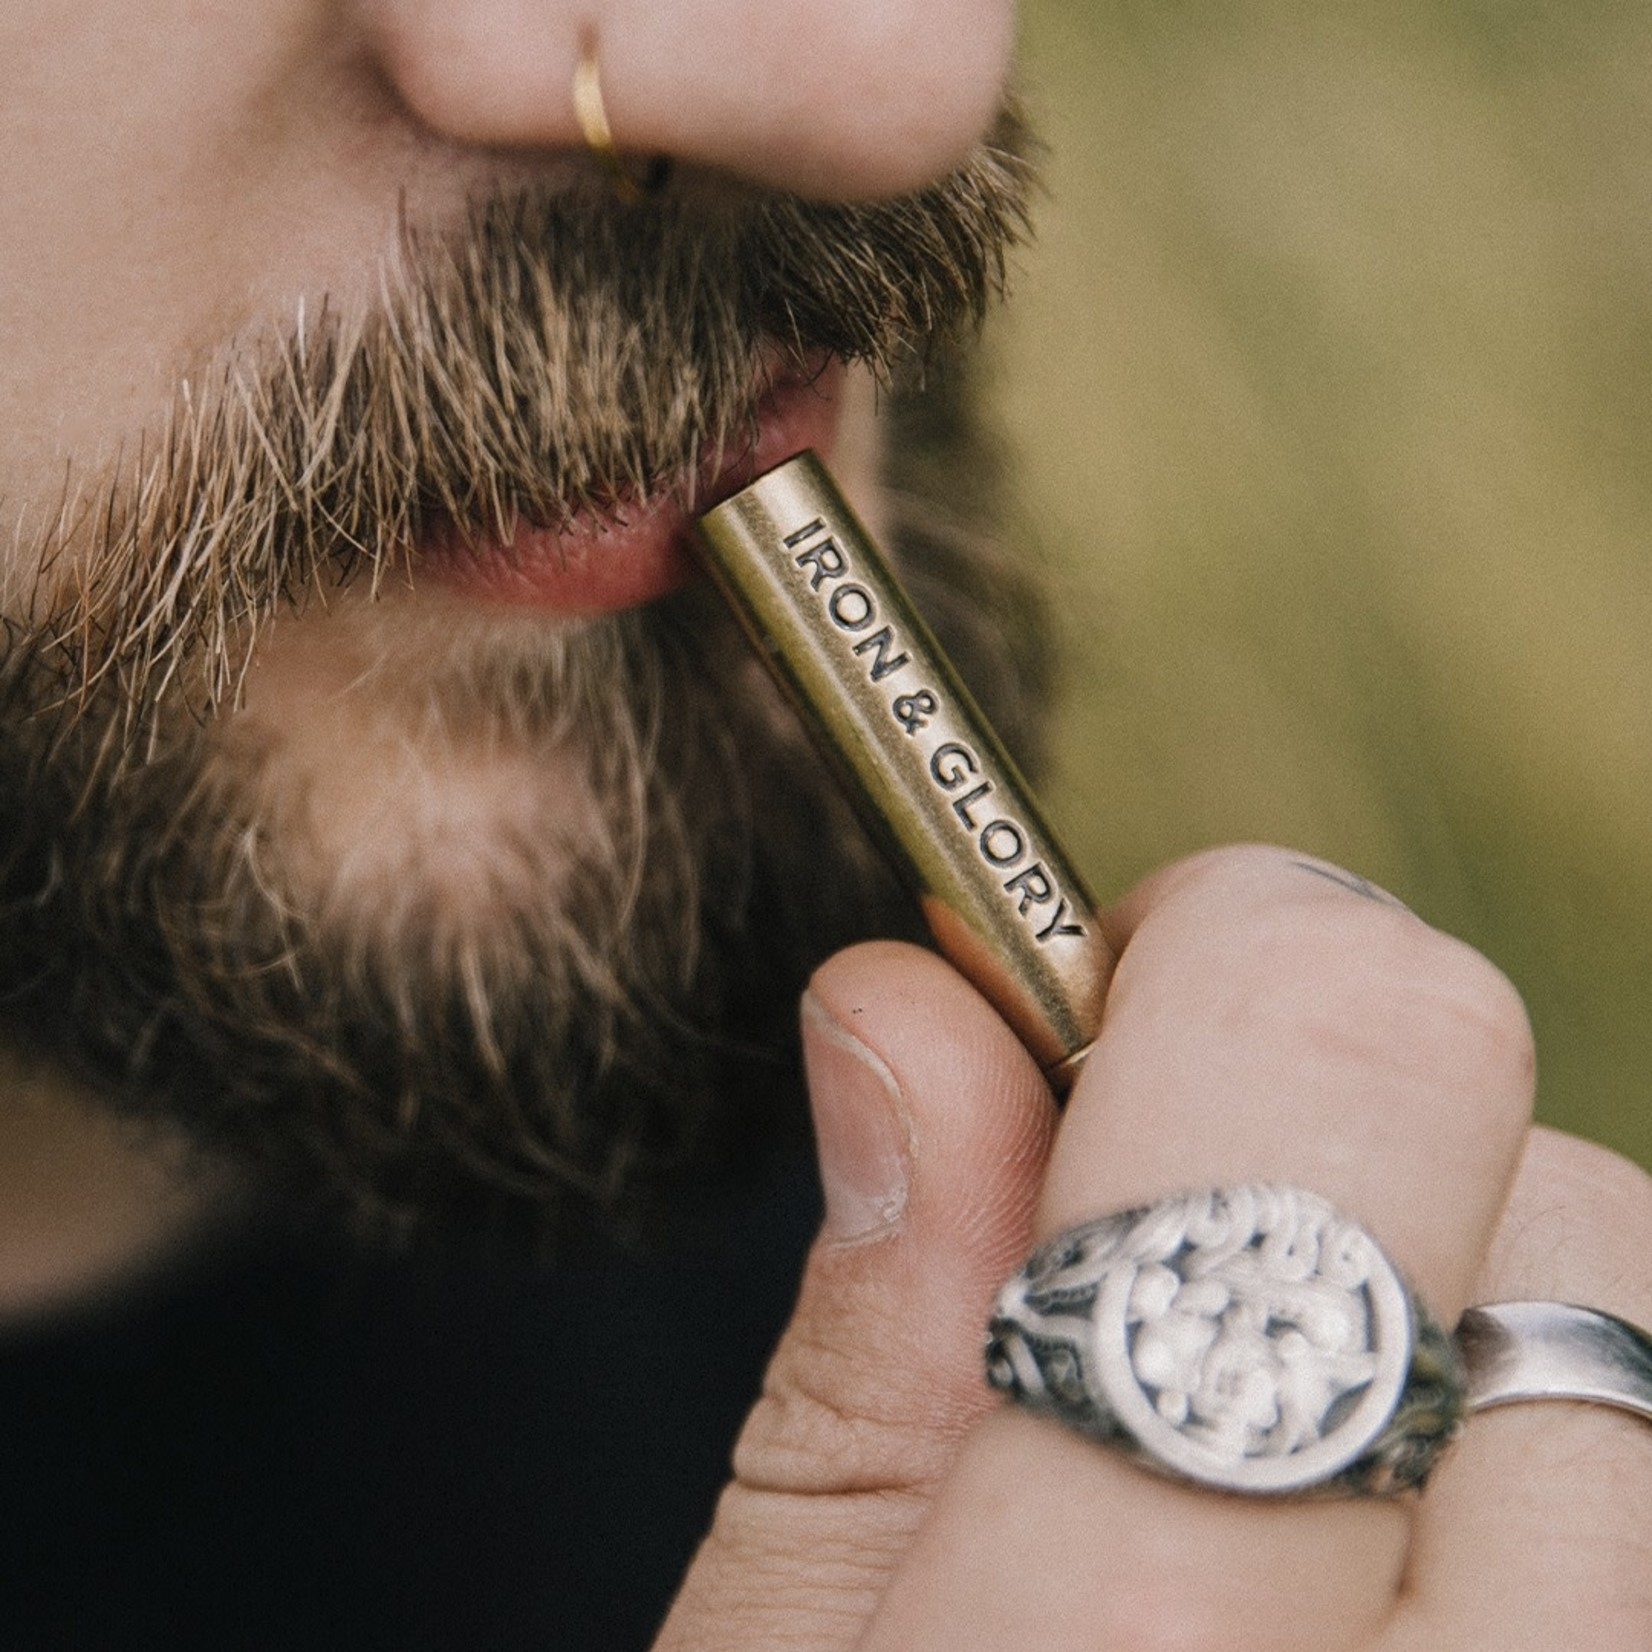 Iron & Glory Blow Whistle Keychain